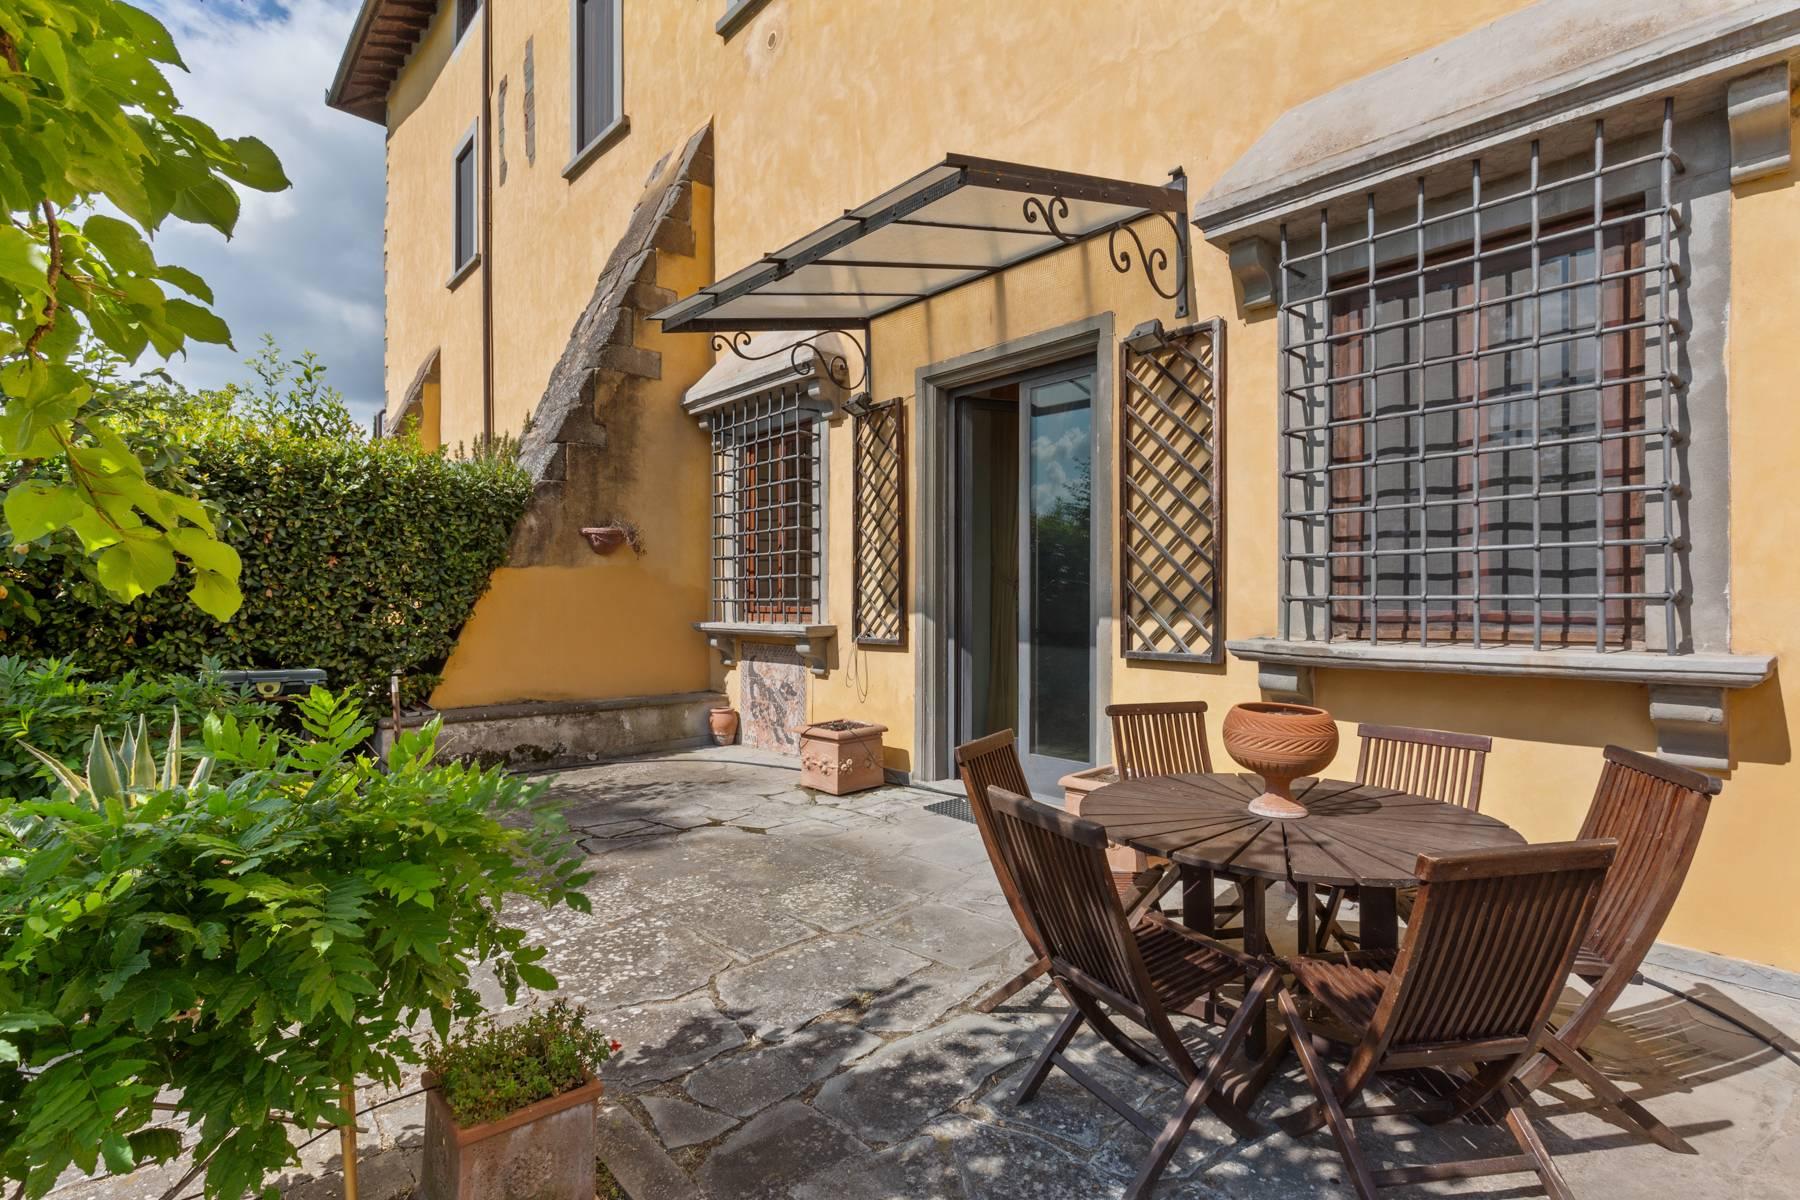 Appartamento in Vendita a Scandicci: 5 locali, 140 mq - Foto 9